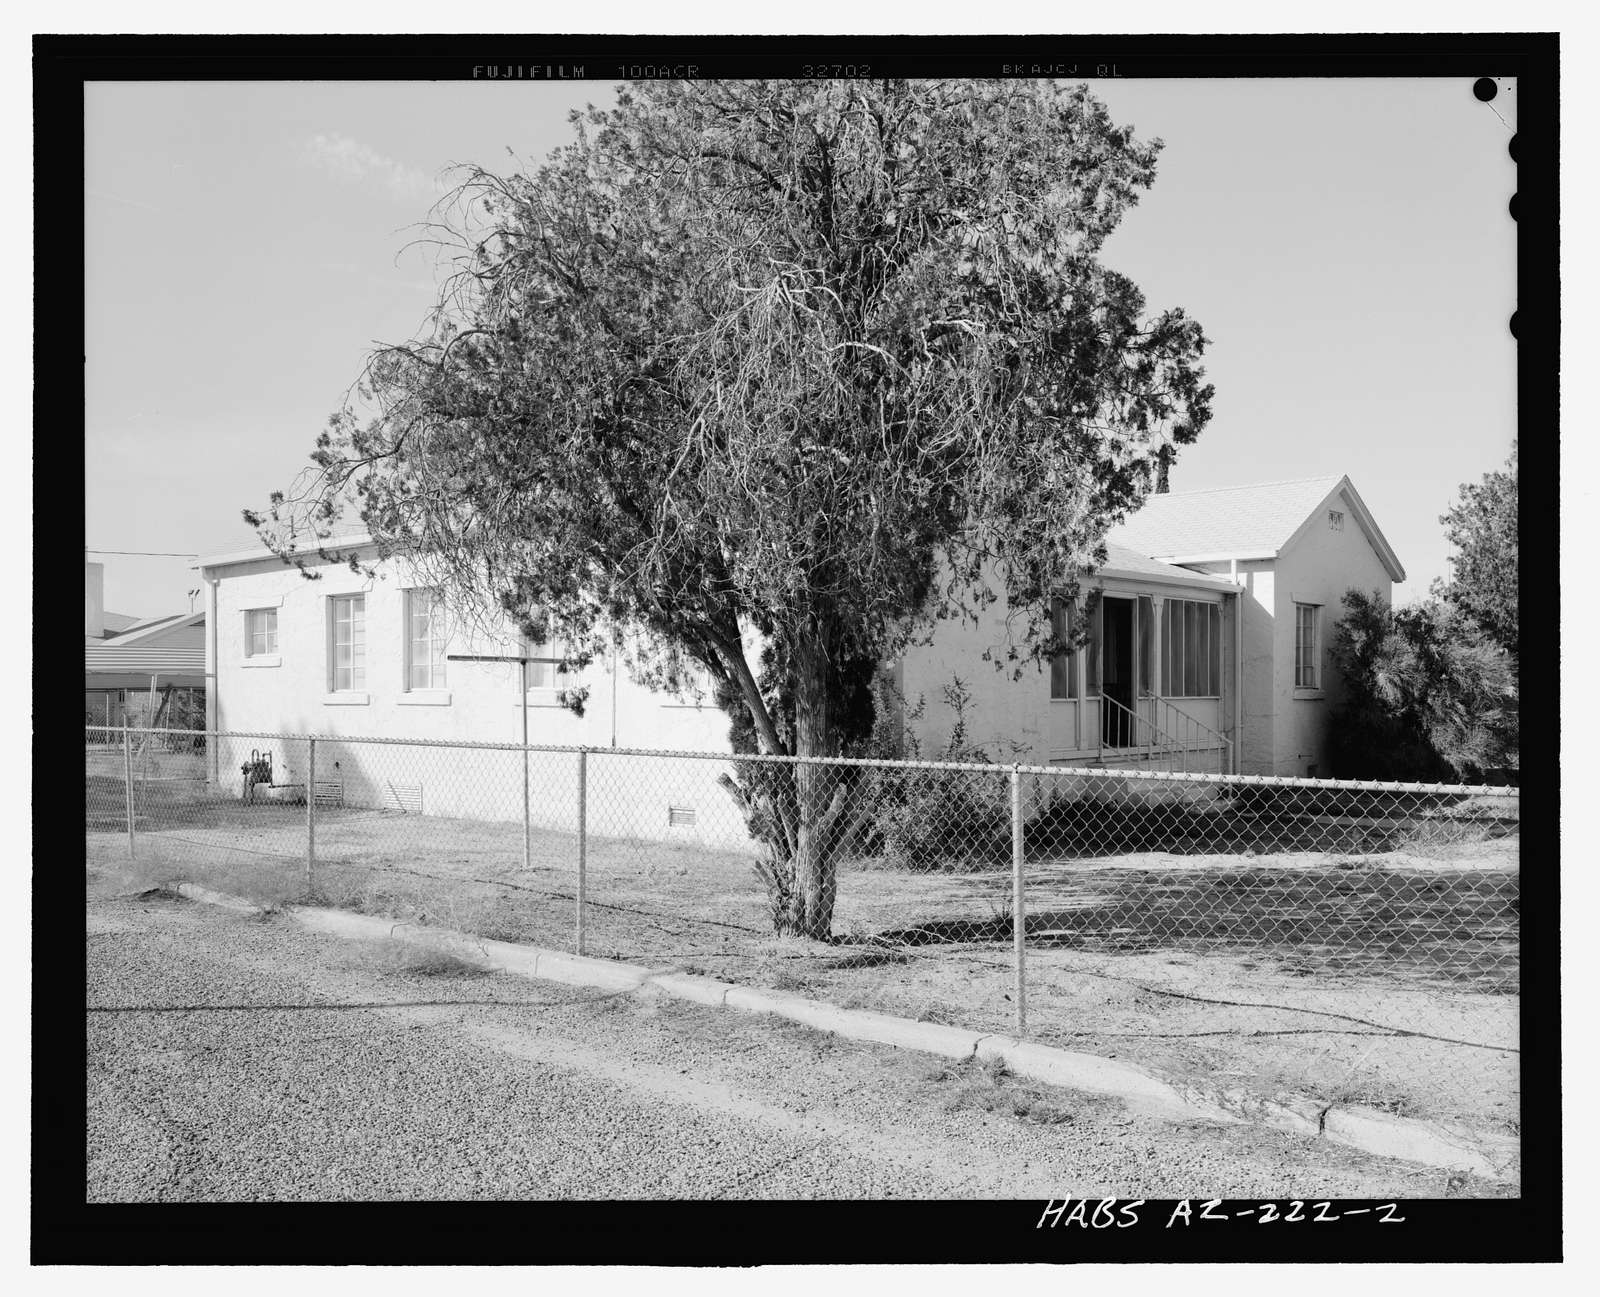 Sacaton Hospital Residence, 315 West Casa Blanca Road, Sacaton, Pinal County, AZ